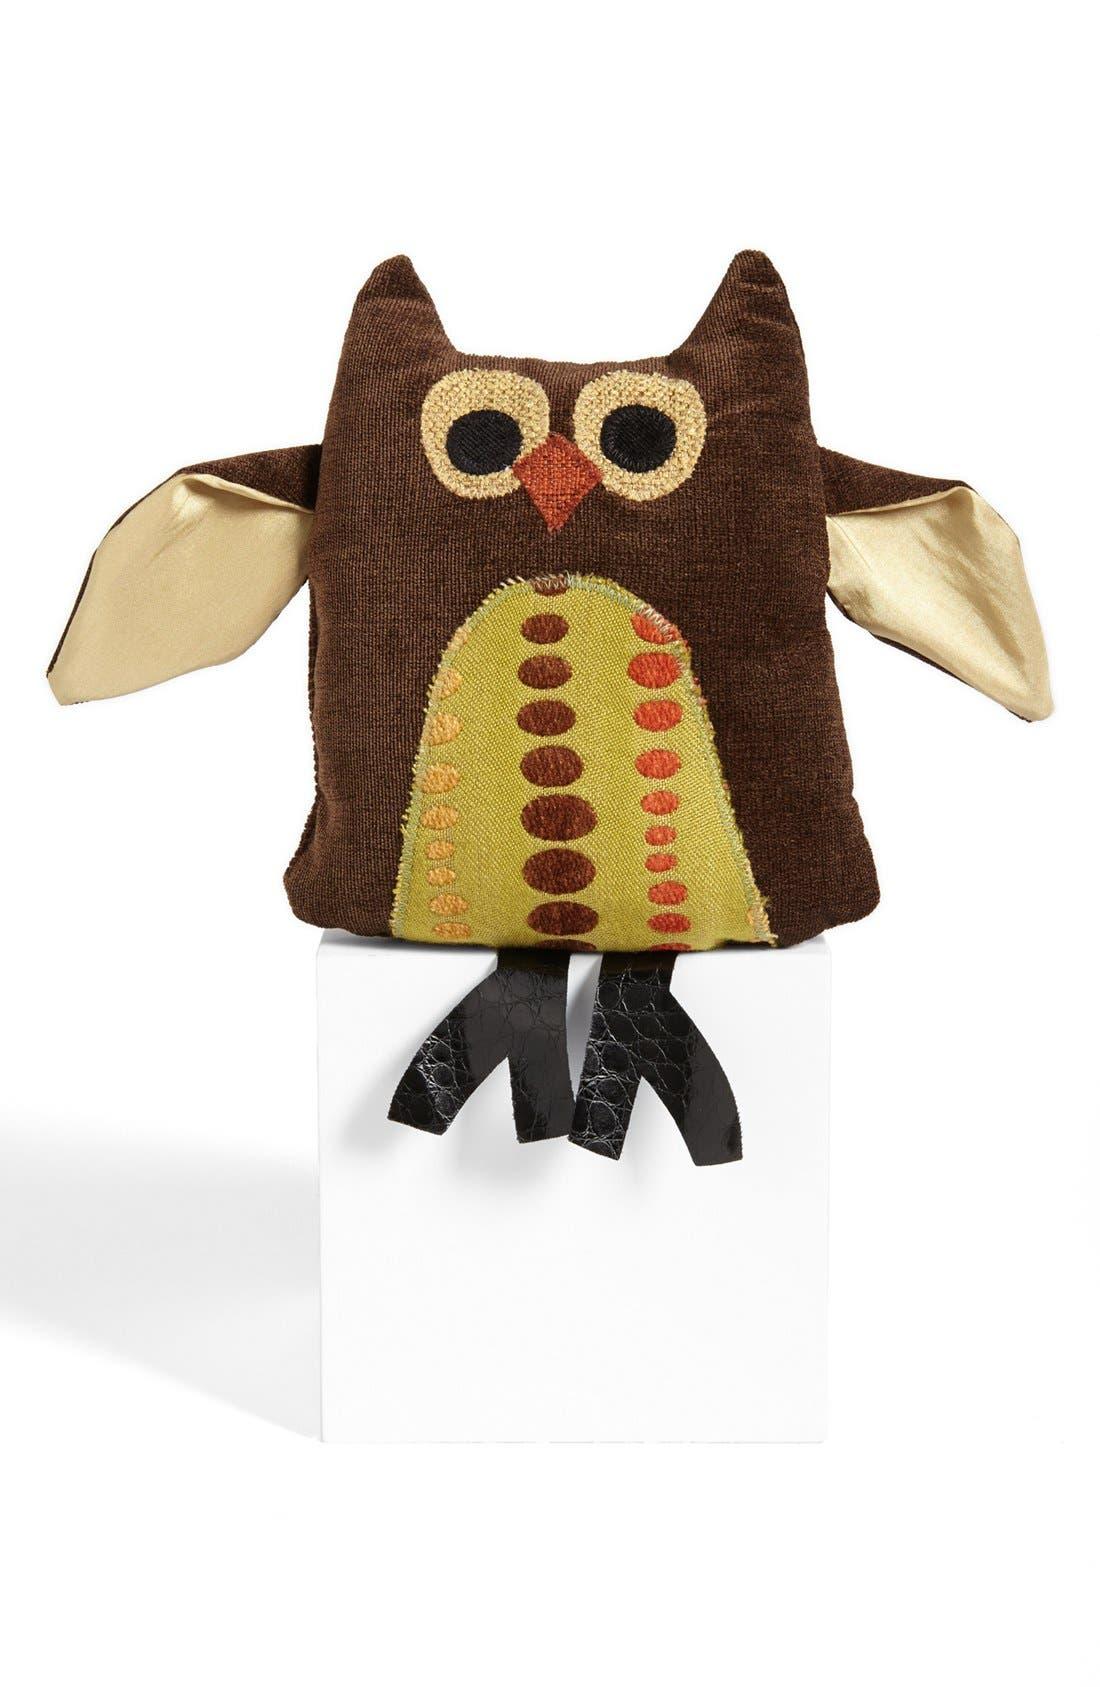 Alternate Image 1 Selected - Woof & Poof 'Kiwi Dot' Owl Bean Bag